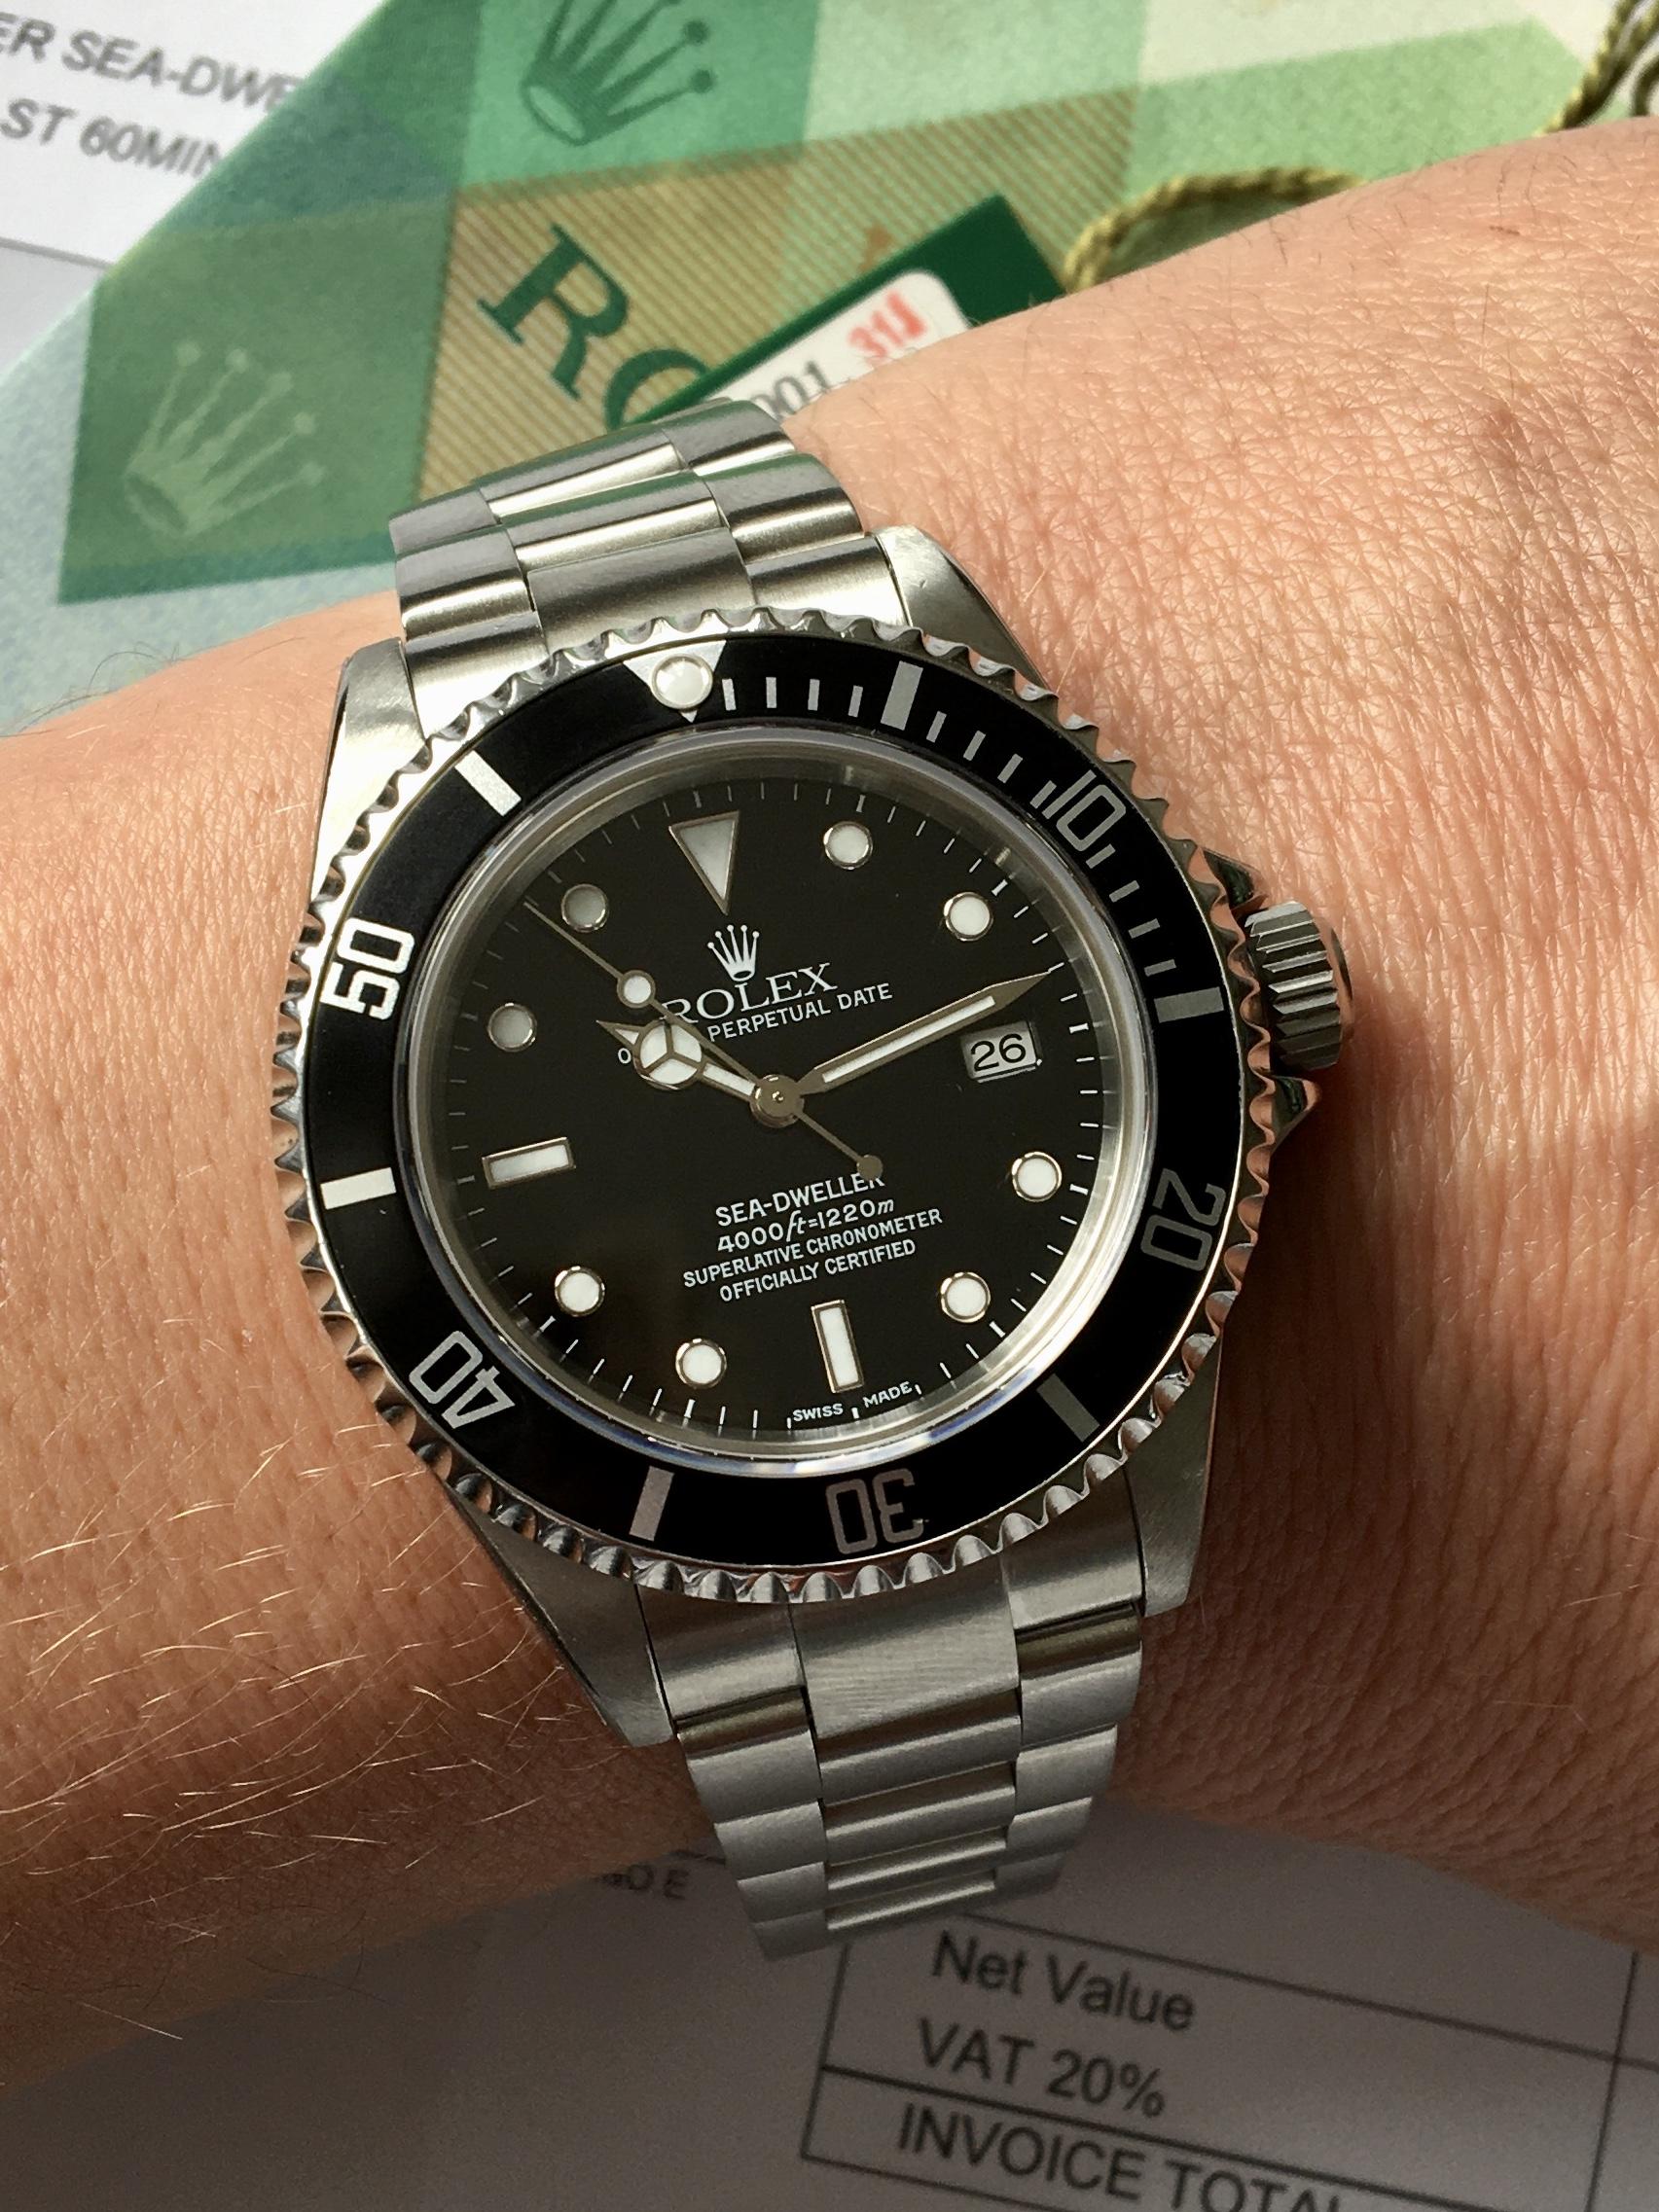 2003 Sea-Dweller 4000